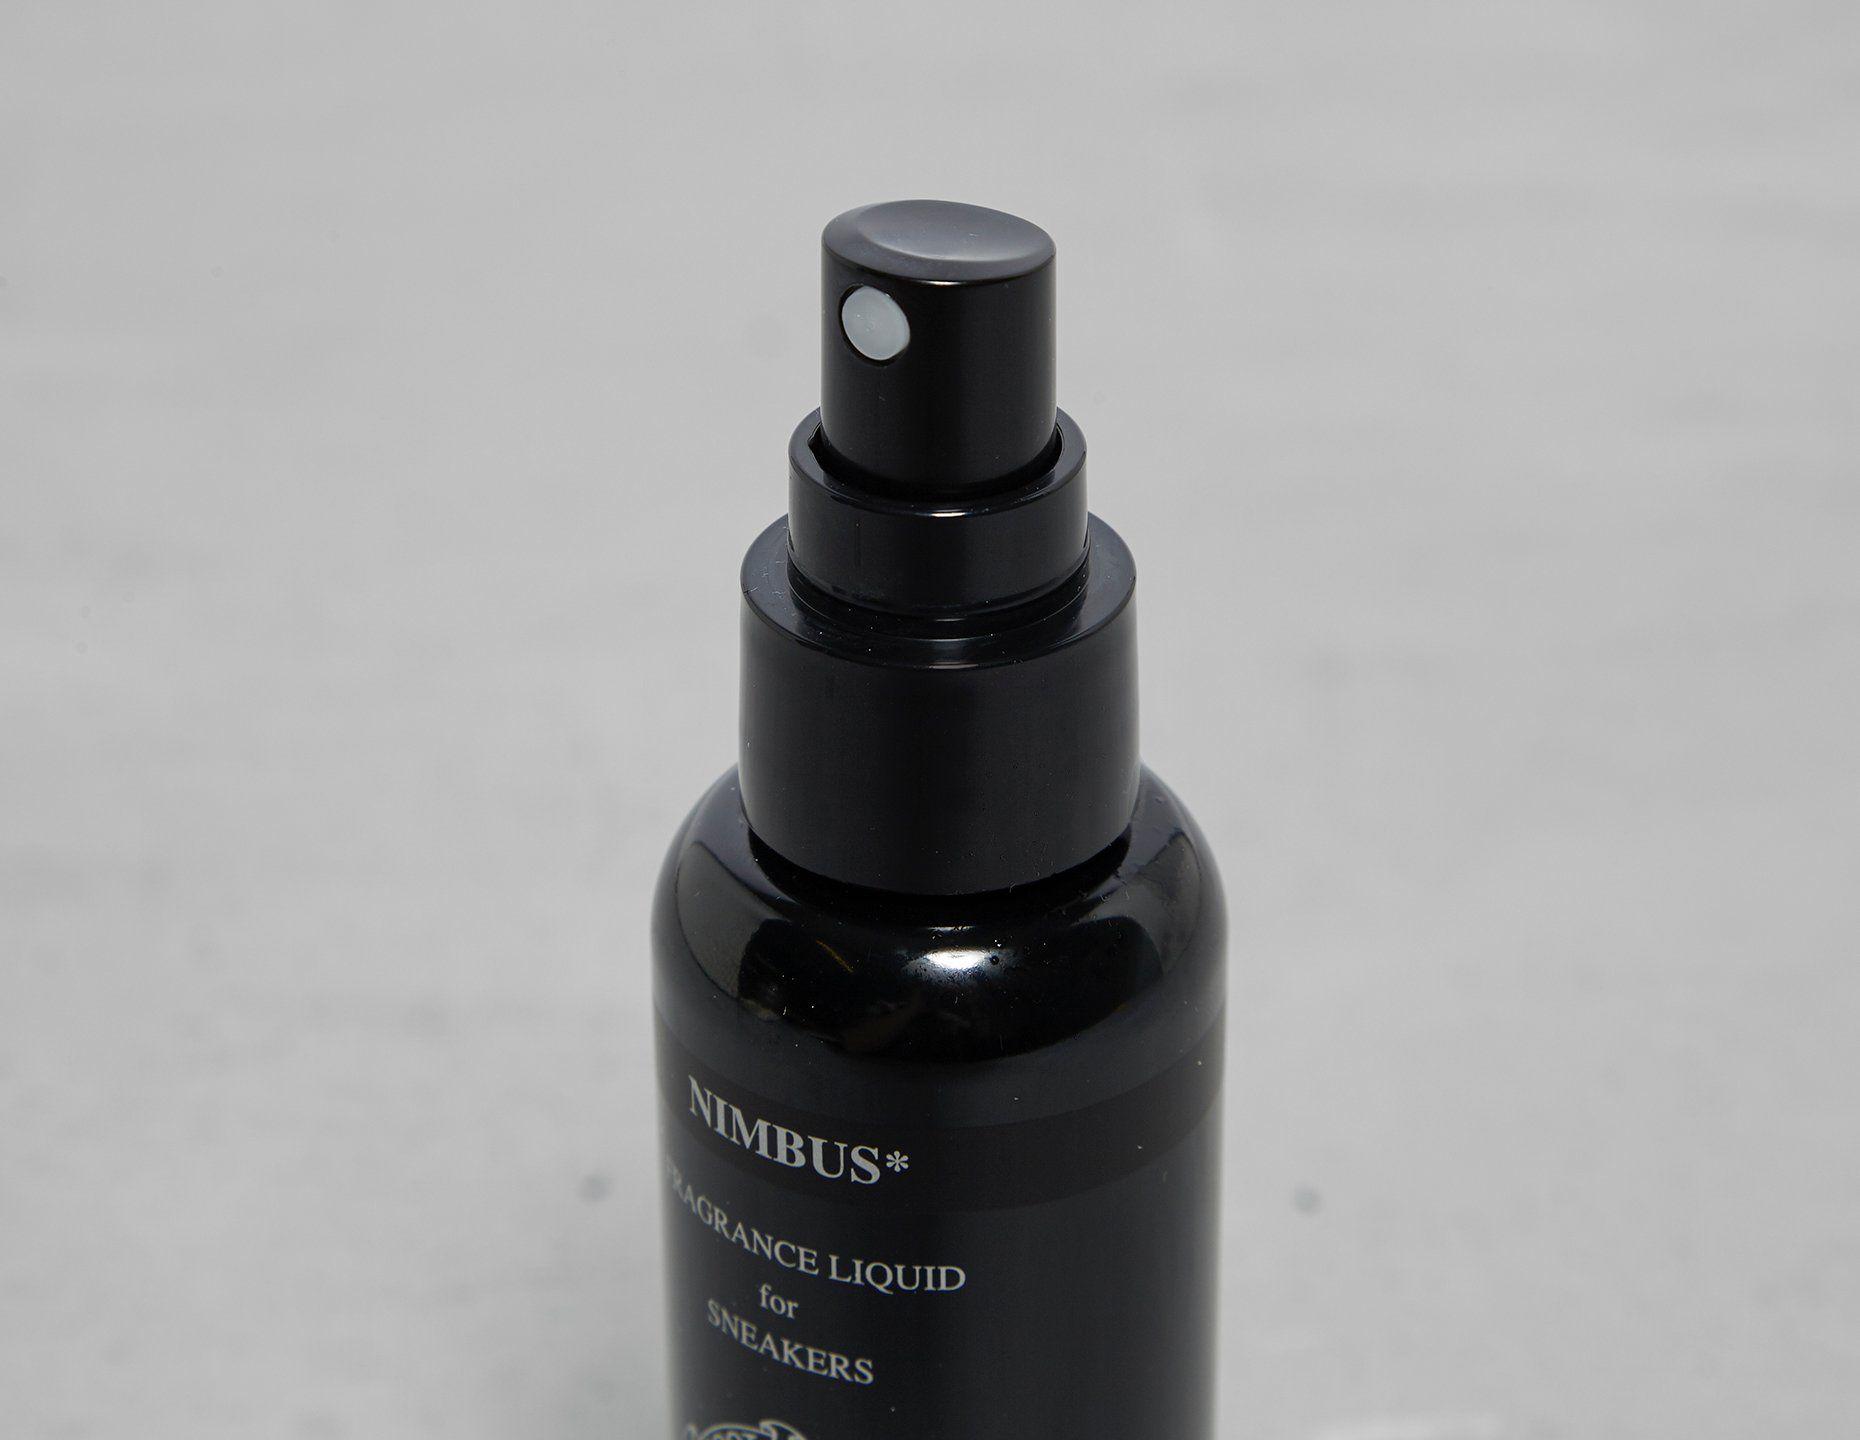 RetaW x Footpatrol 'NIMBUS' Sneaker Liquid Fragrance